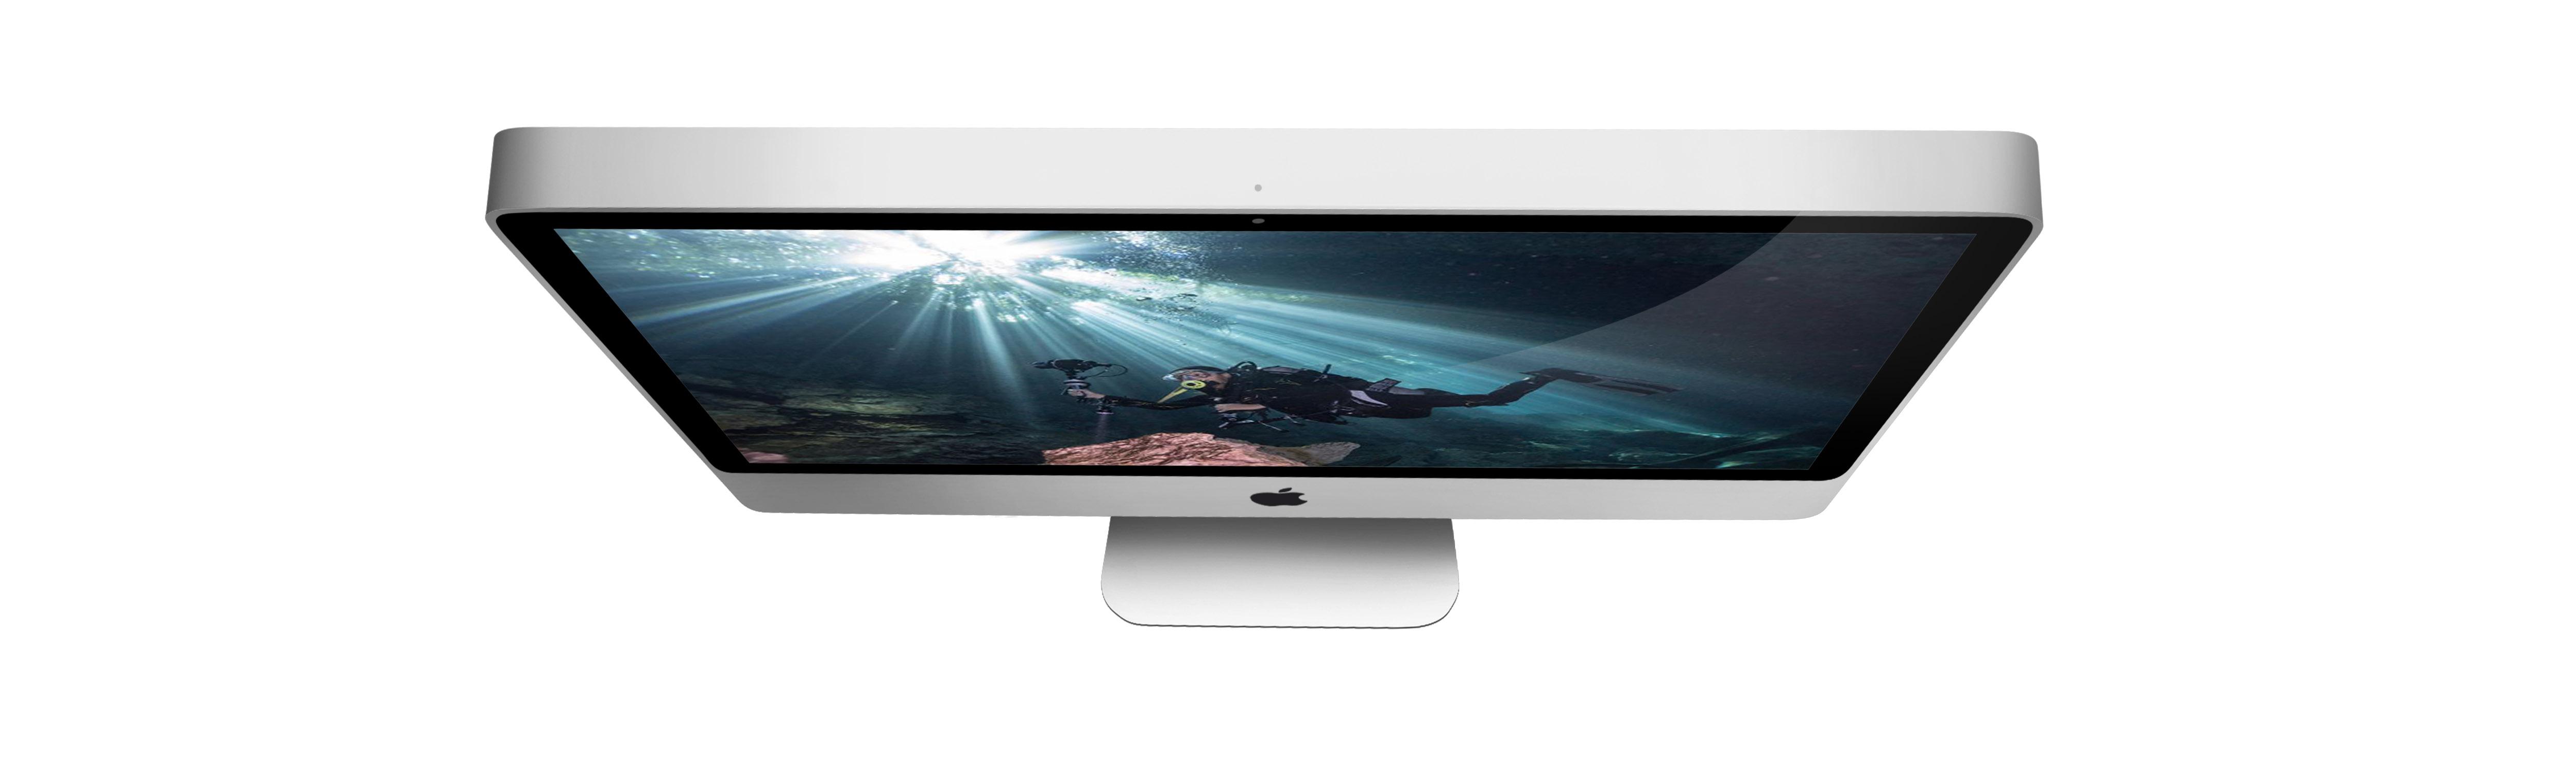 Apple iMac - Apple Support Hamburg